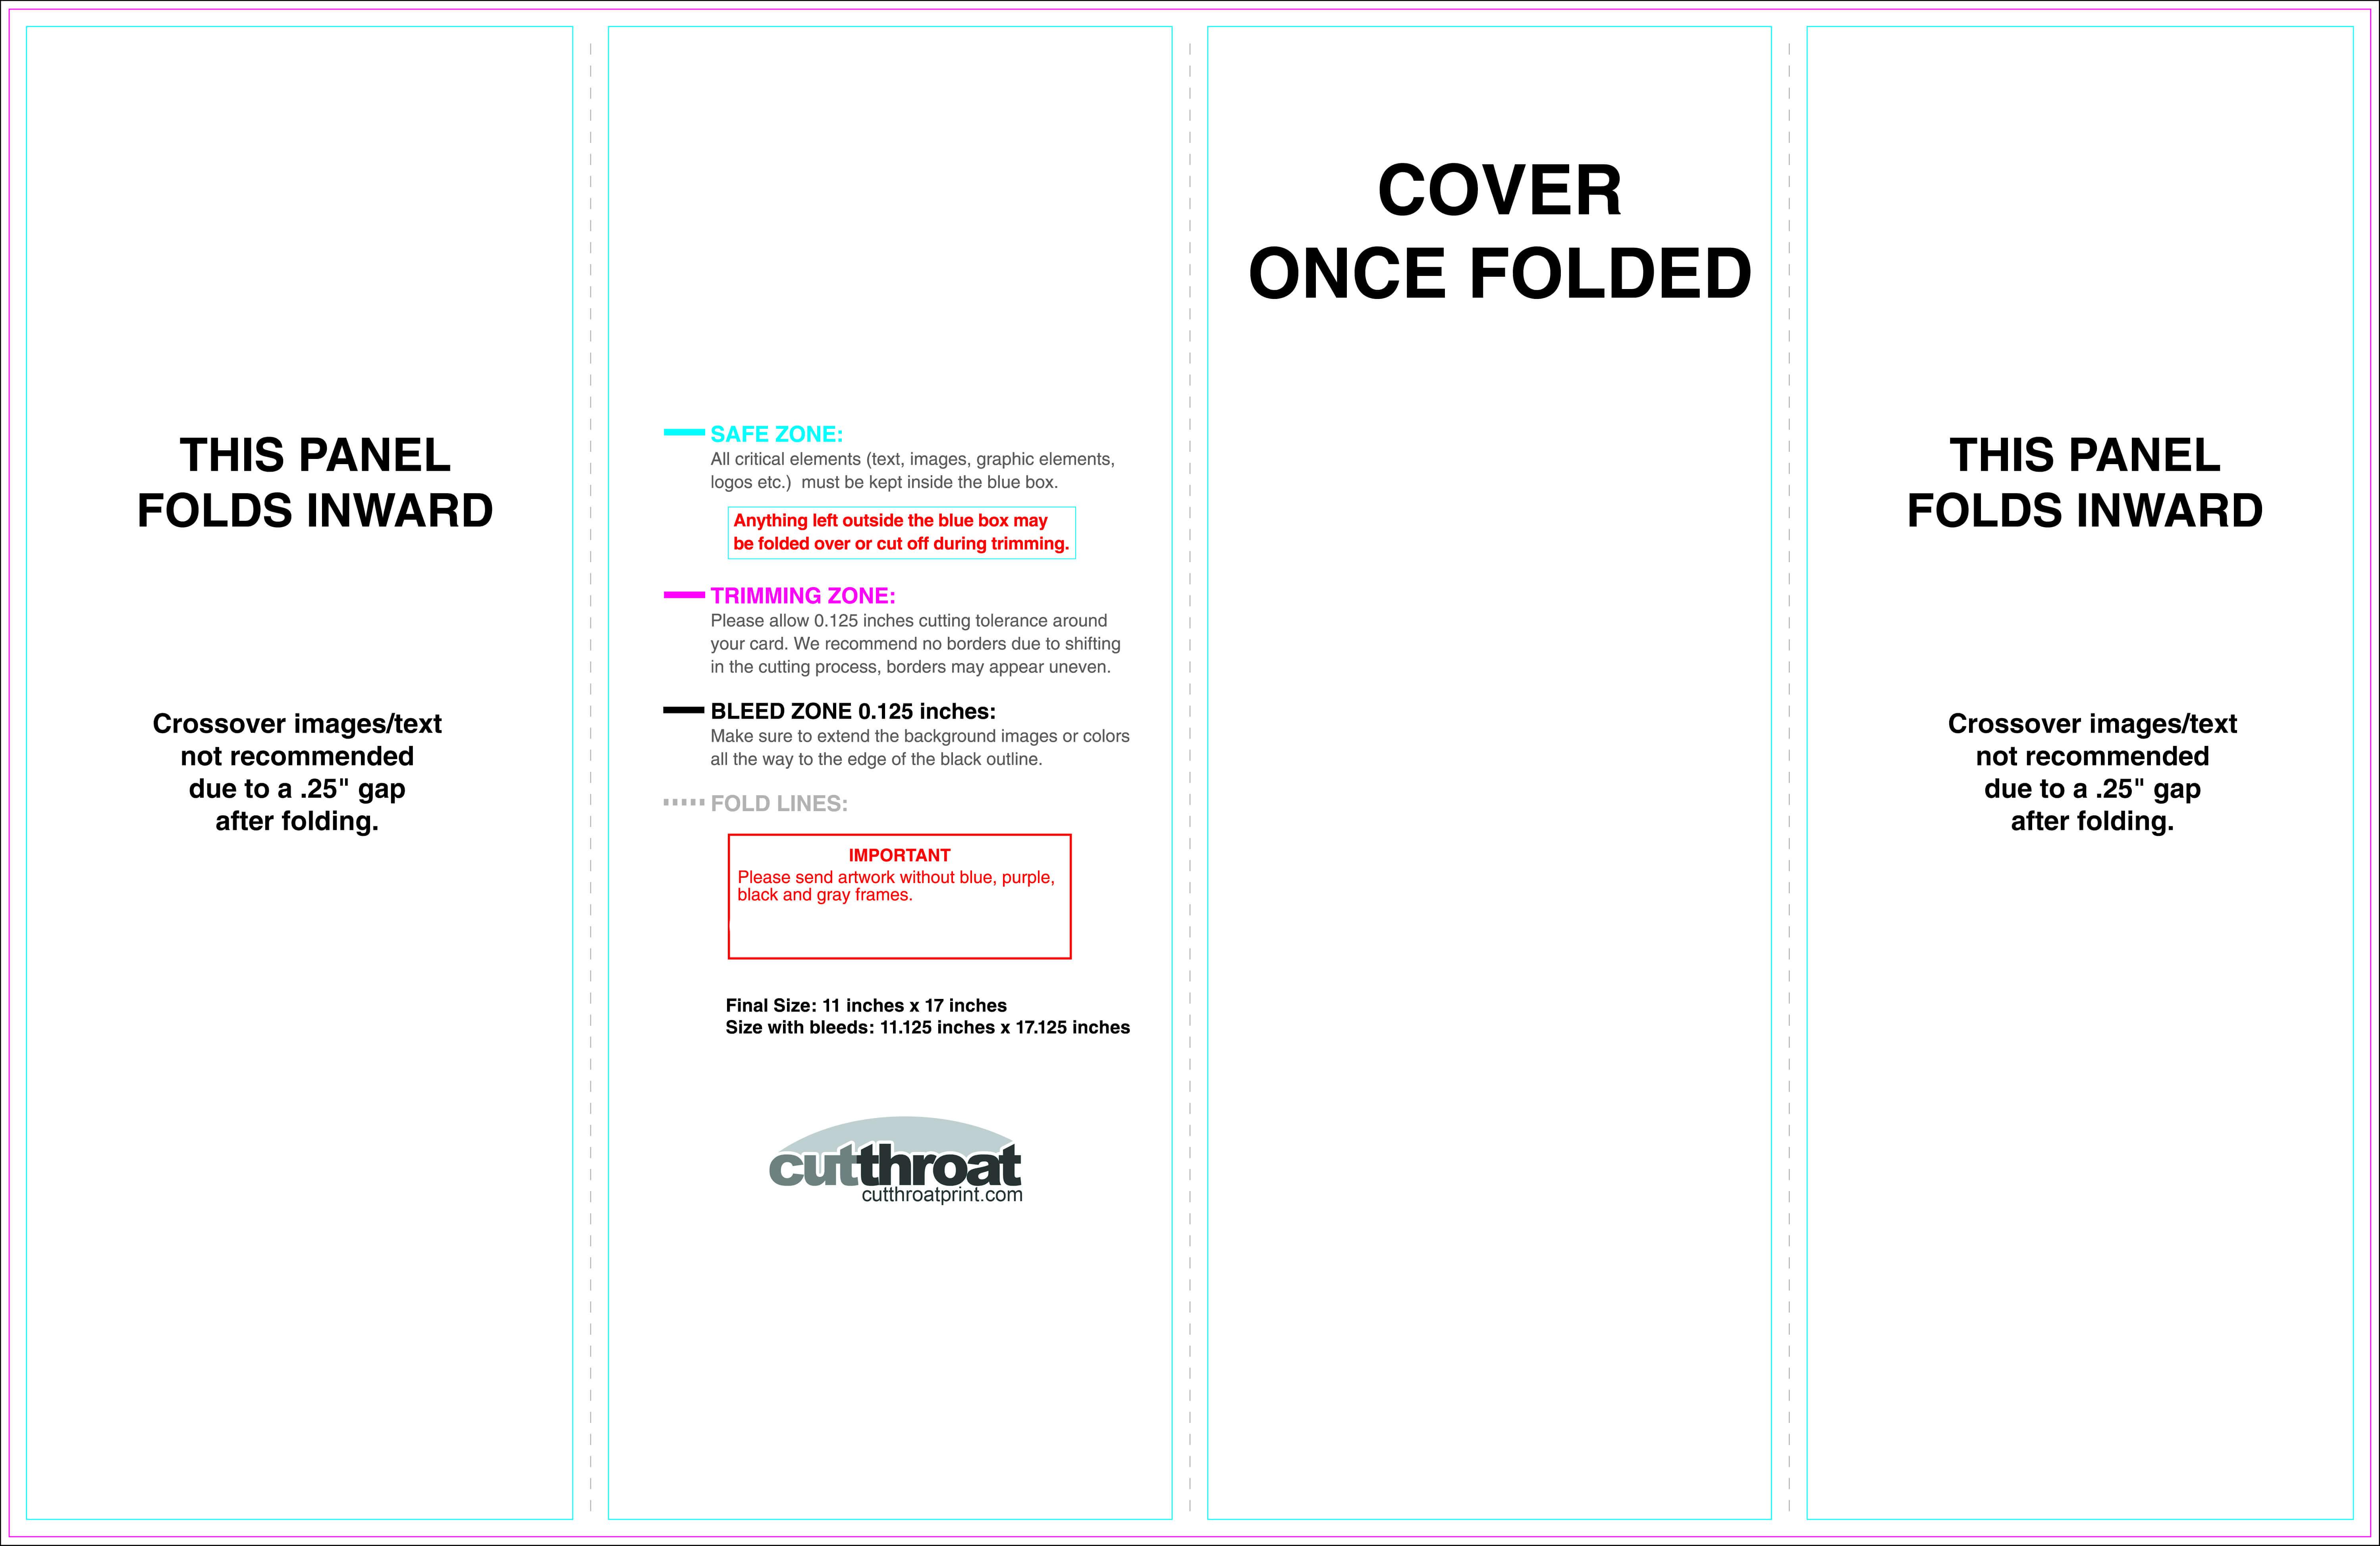 014 Template Ideas Gate Fold Brochure 11X17 Doublegatefold regarding Gate Fold Brochure Template Indesign